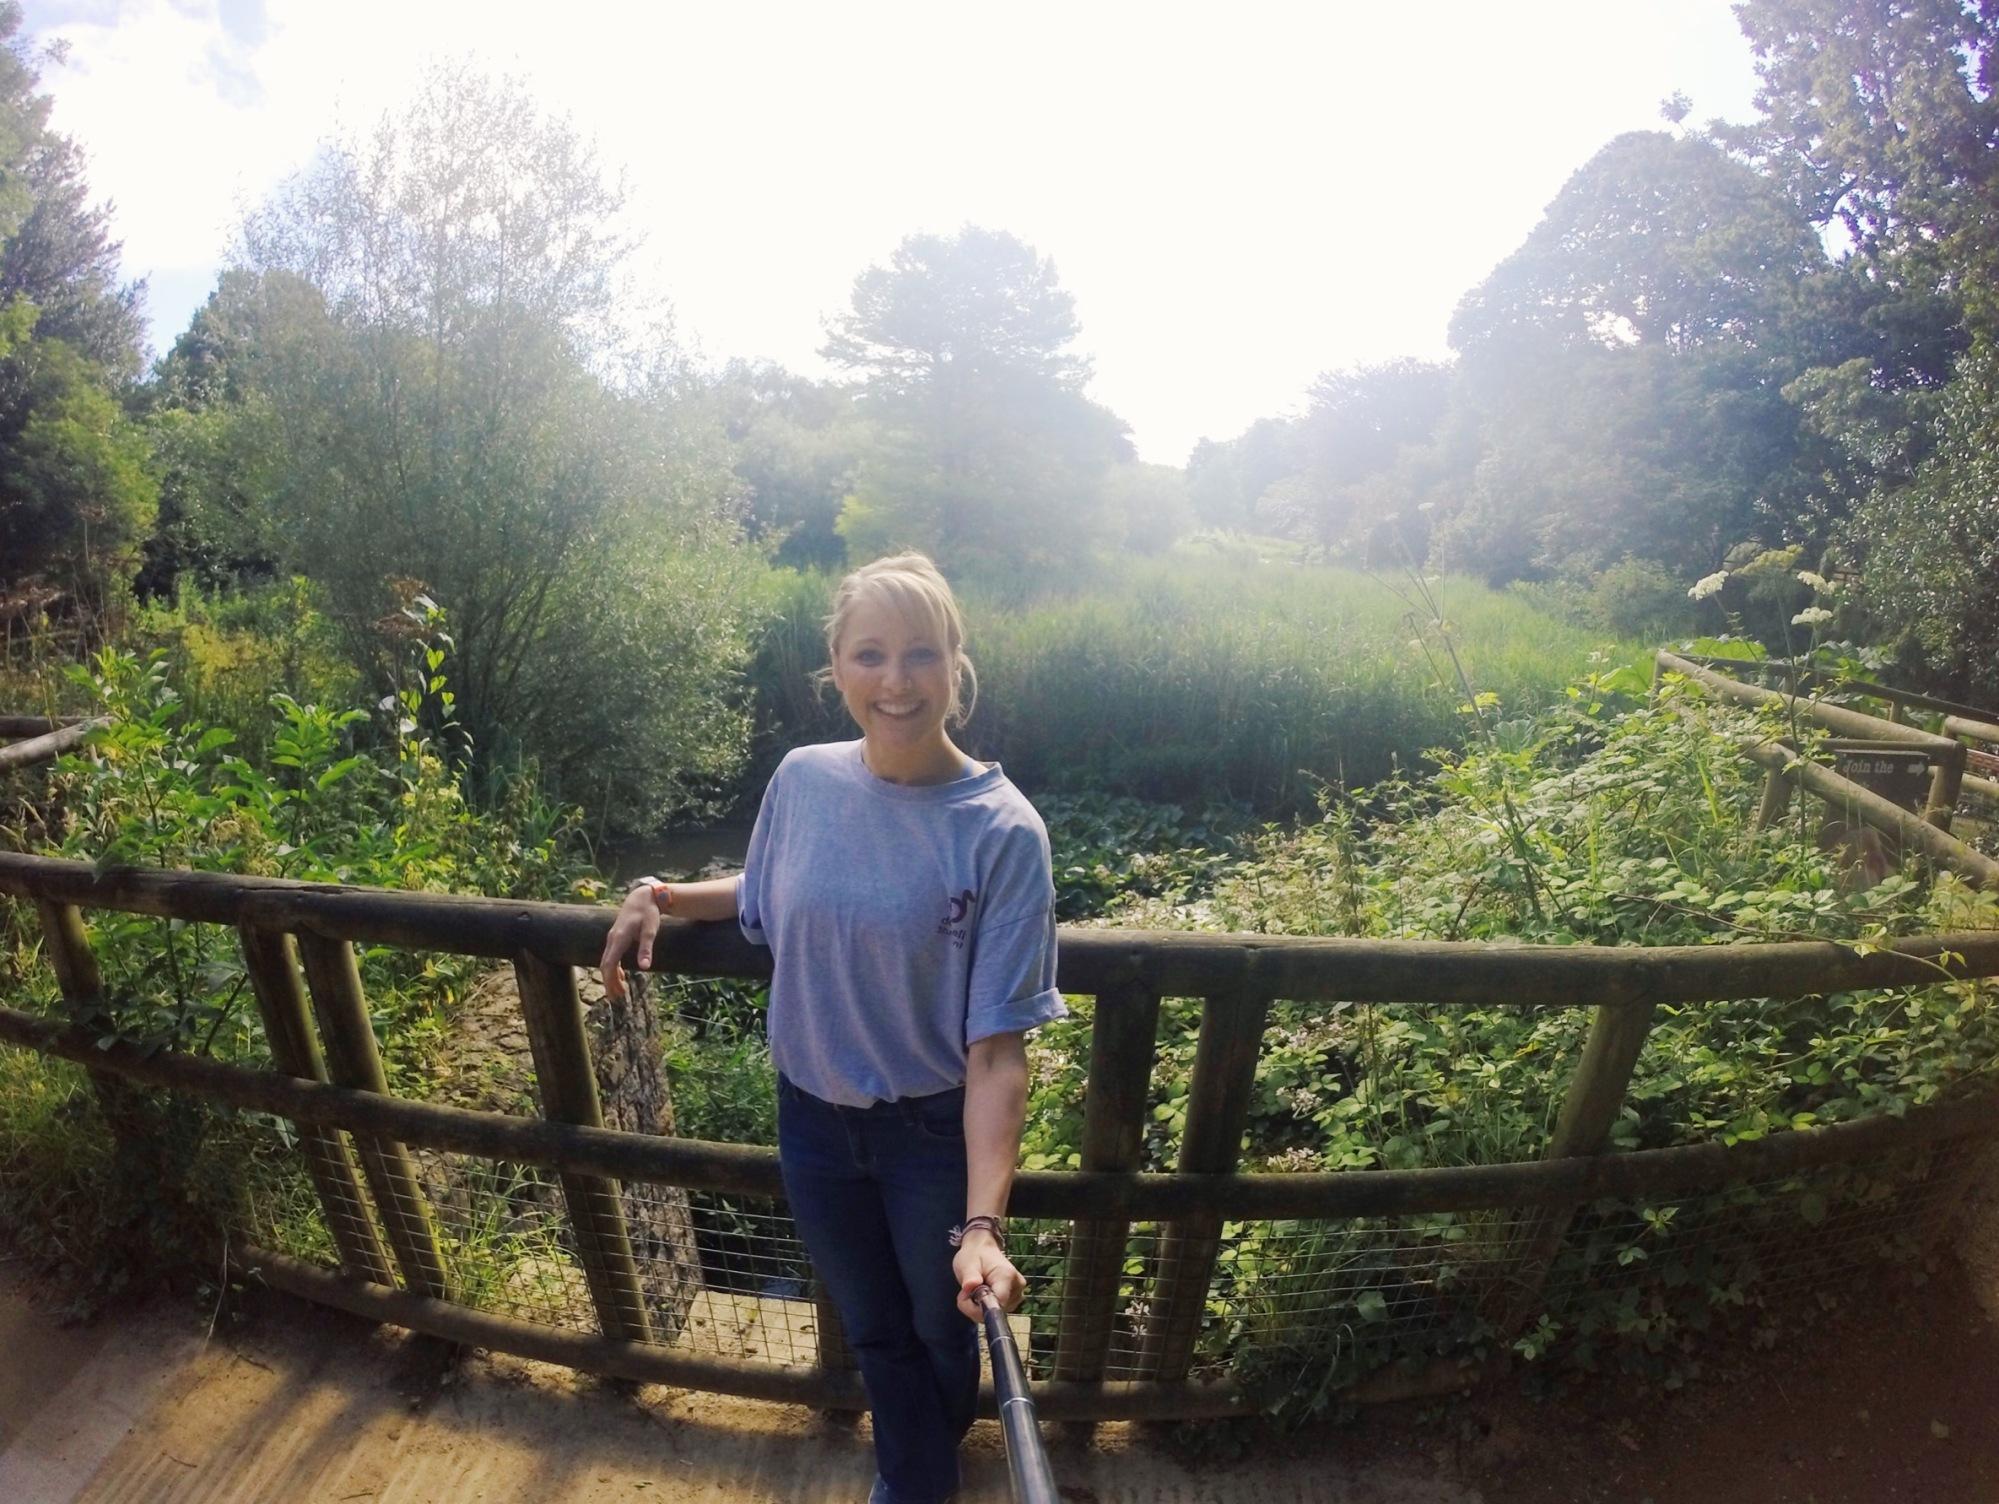 Me at Durrell wildlife park